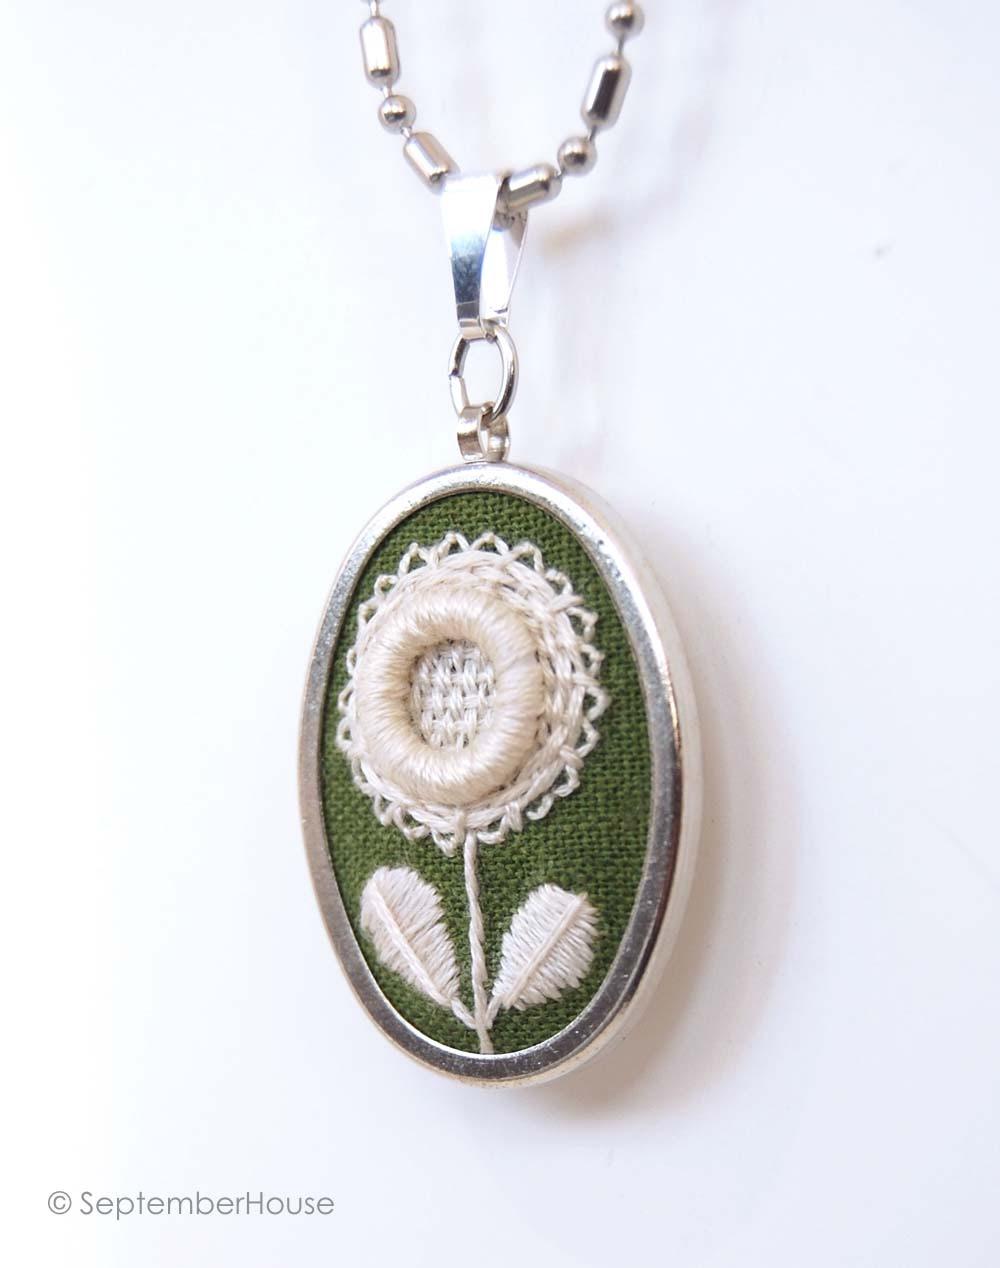 septemberhouse embroidery handmade pendant necklace